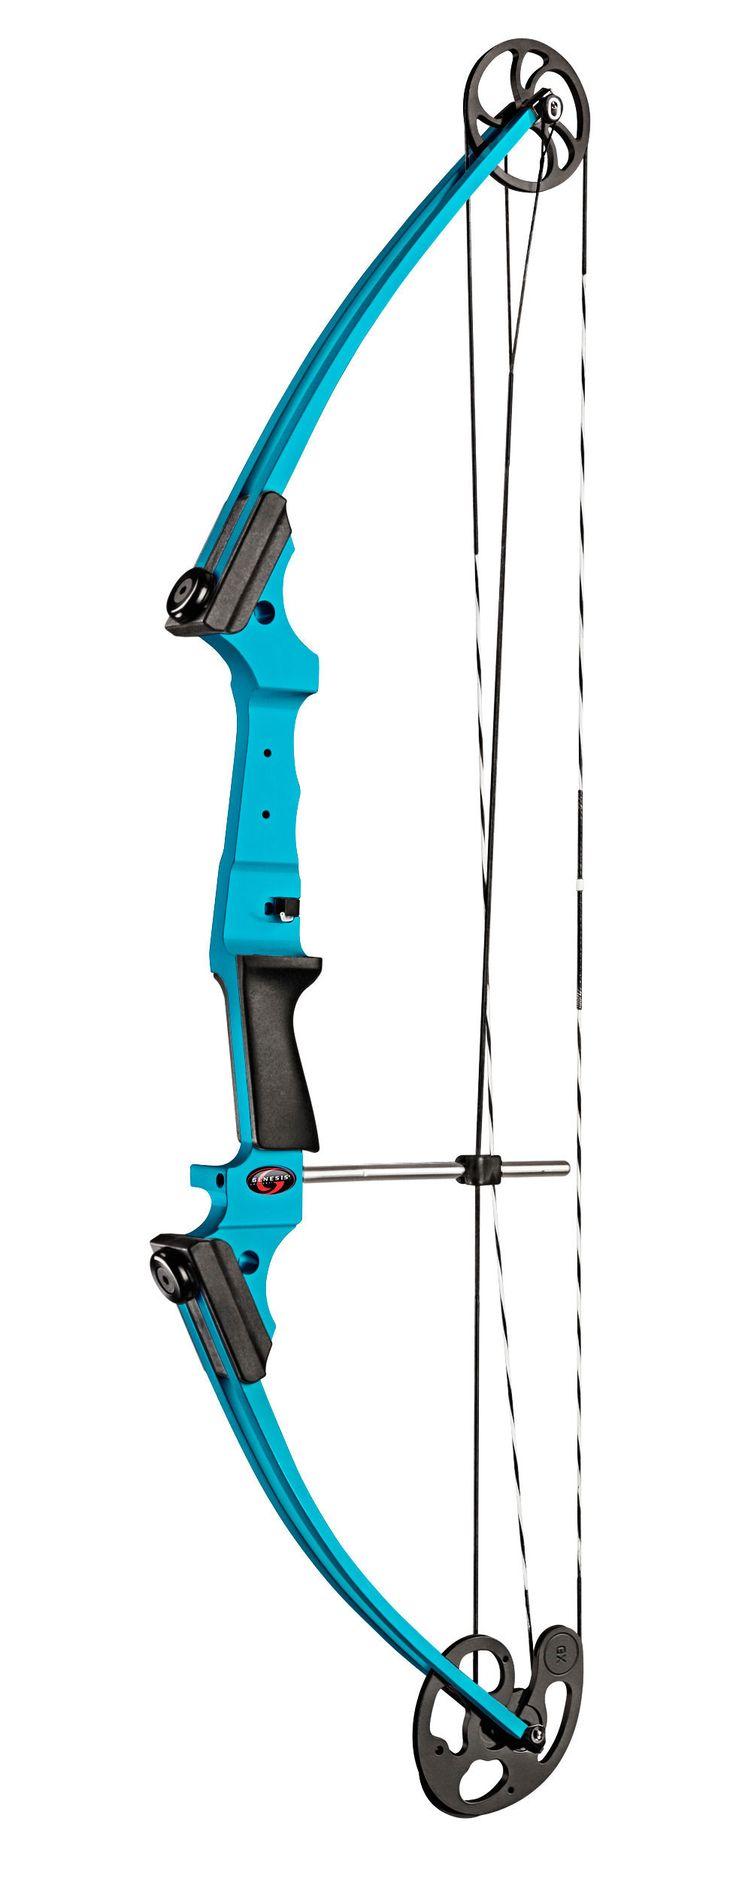 Genesis Original | Genesis® Bow #bbarchery #blue #archeryinschools #archery